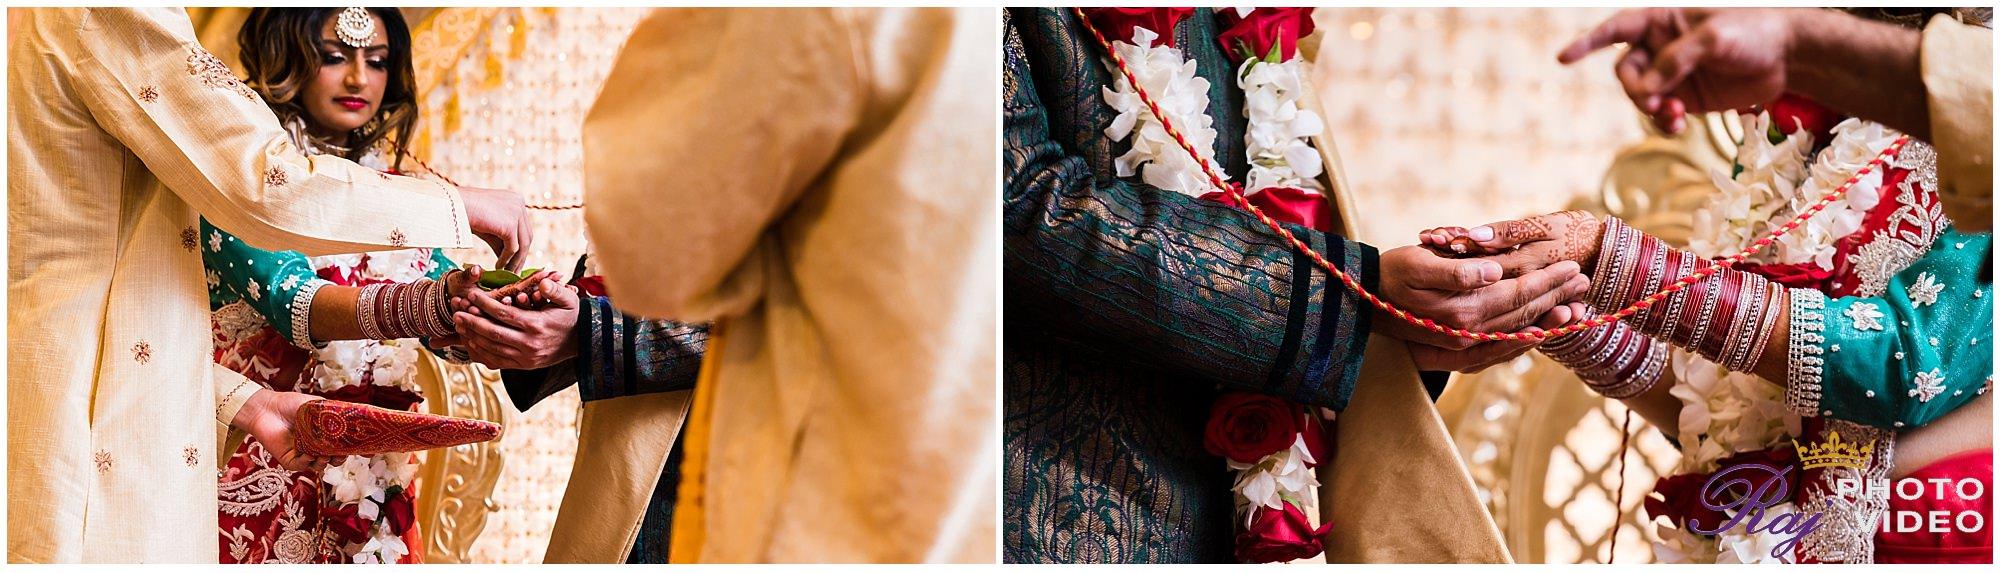 Sri-Guruvaayoorappan-Temple-Marlboro-NJ-Indian-Wedding-Chiyomi-Scott-00022.jpg